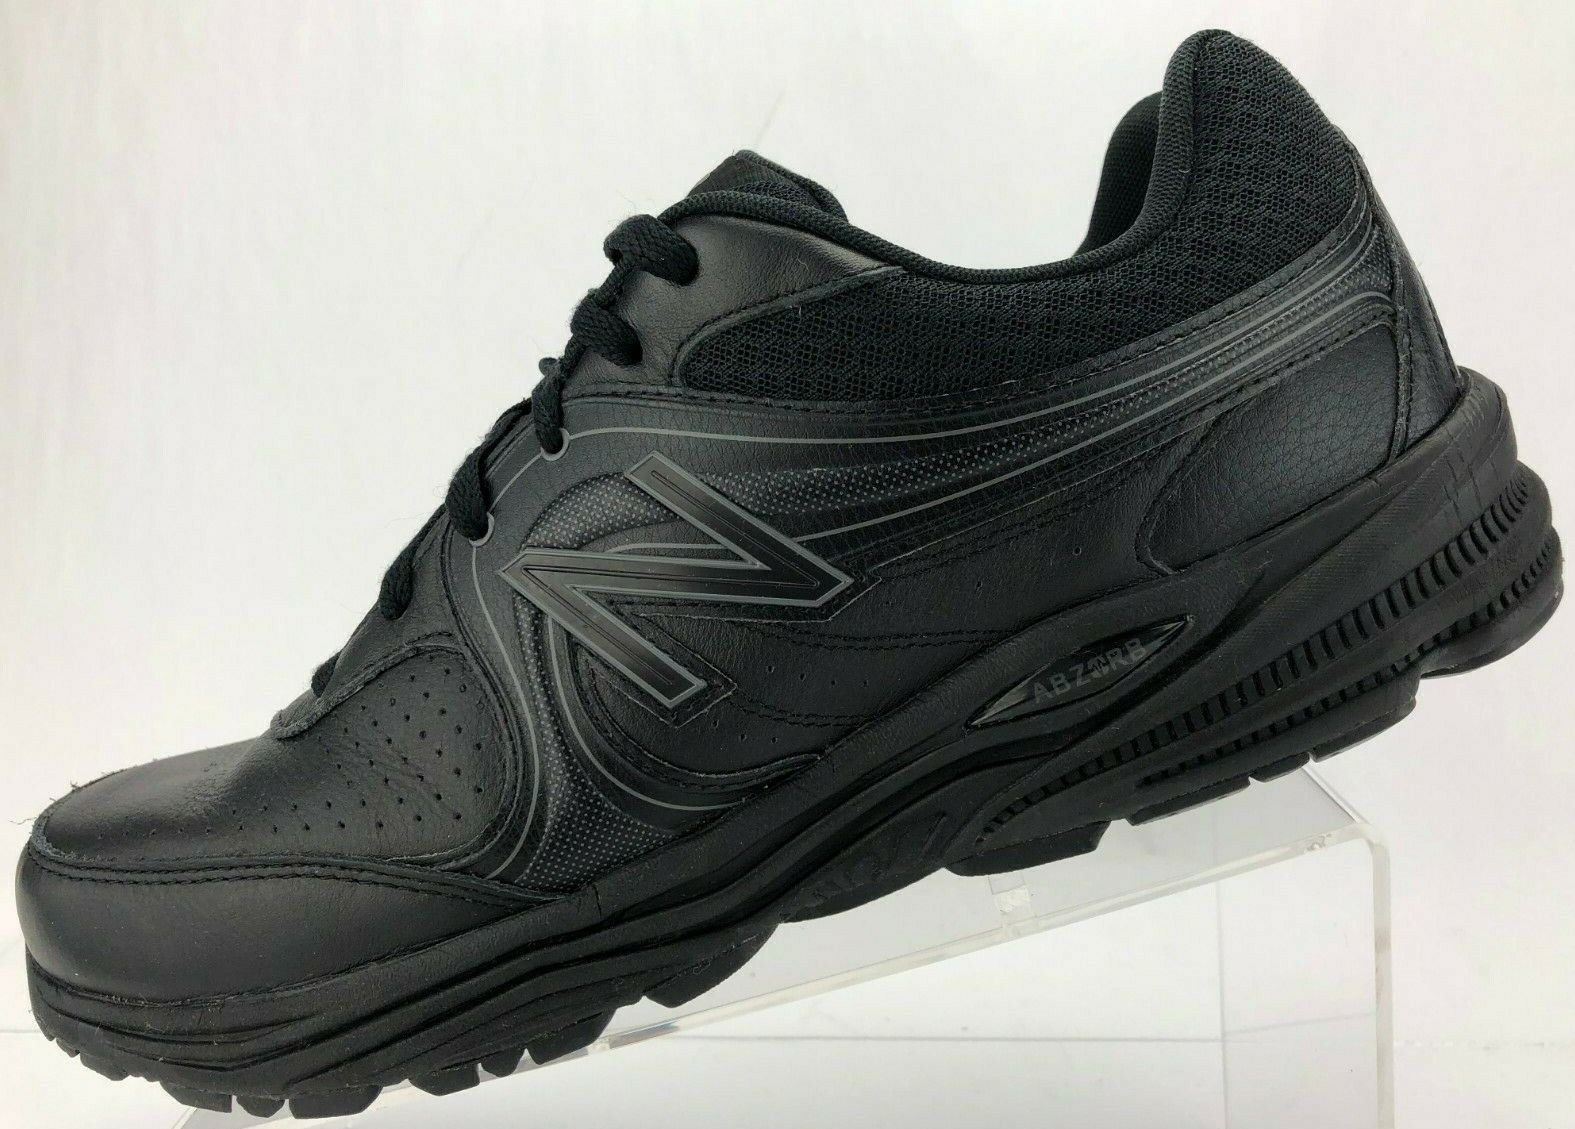 Zapatos Para Caminar Negro 840v2 New Balance Fitness Entrenamiento cómodos Tenis Para Hombre 12.5 D